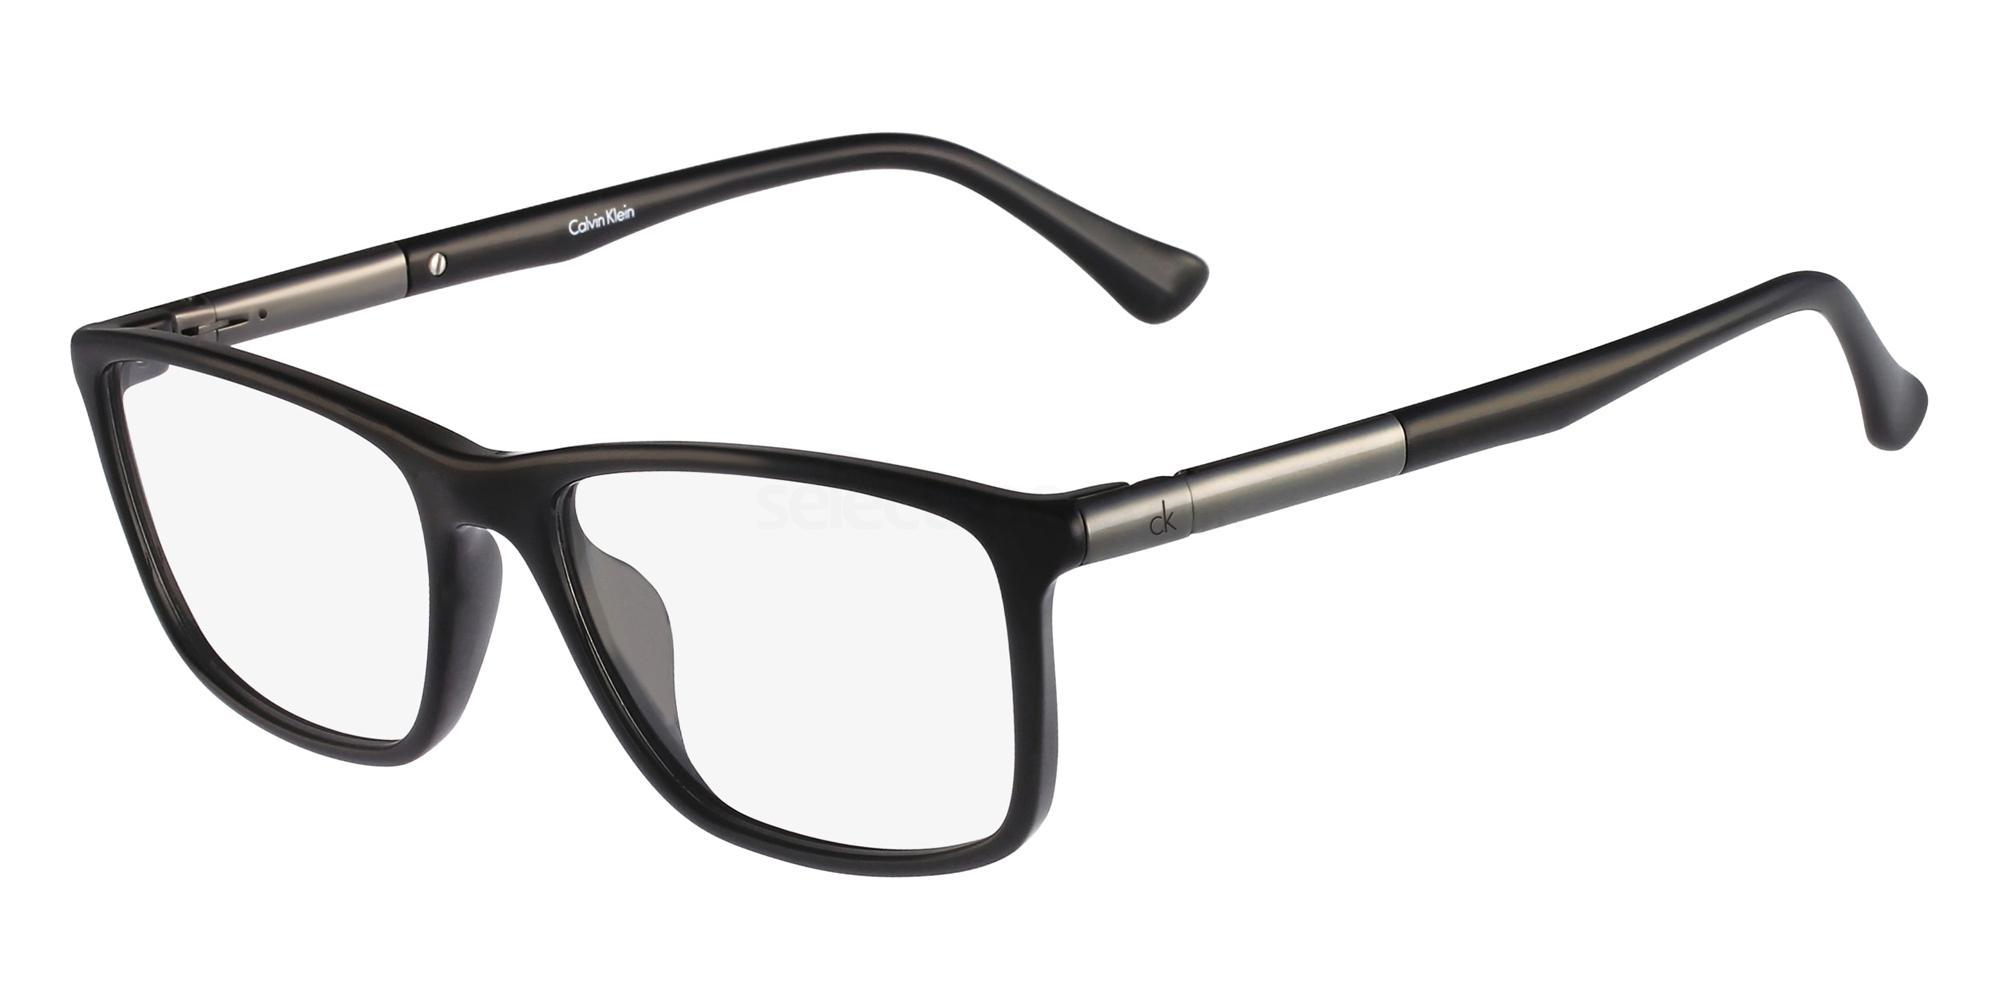 001 CK5864 Glasses, Calvin Klein